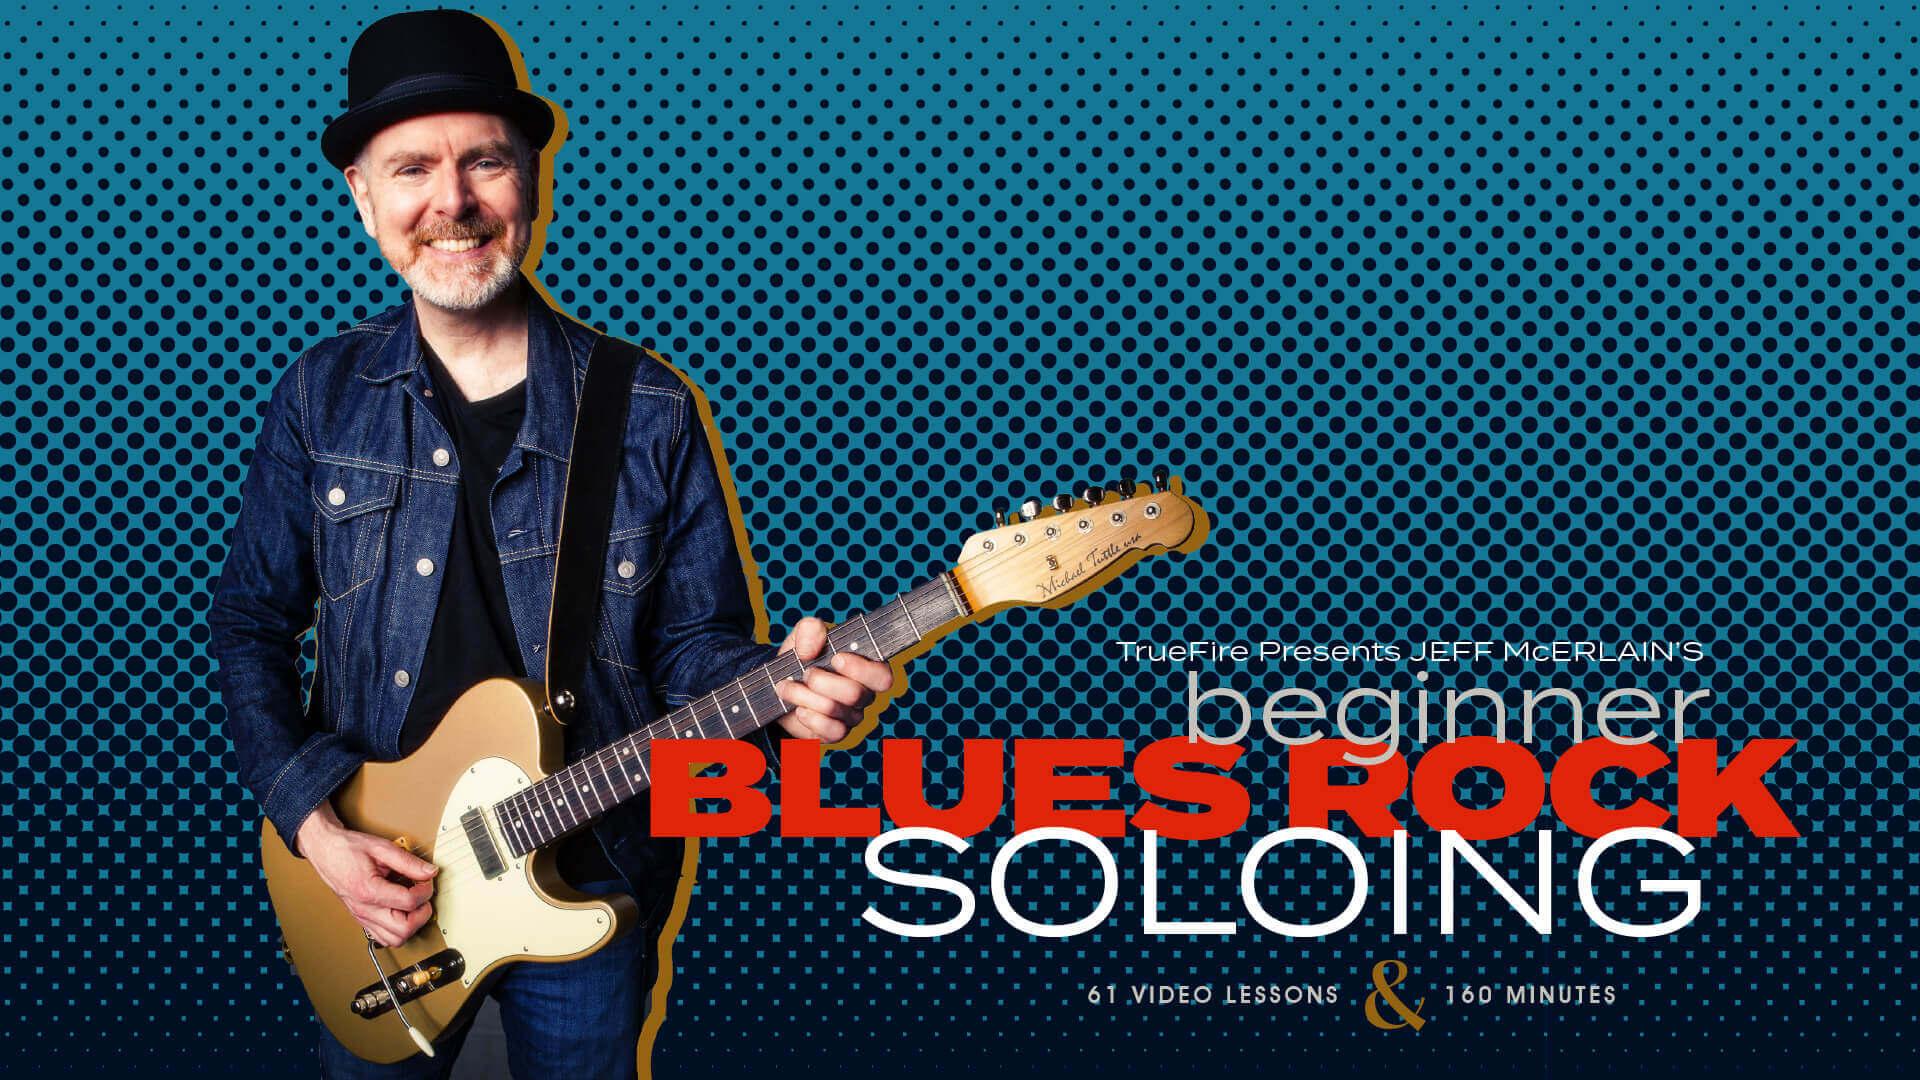 Beginner Blues-Rock Soloing - Guitar Lessons - Jeff McErlain - TrueFire